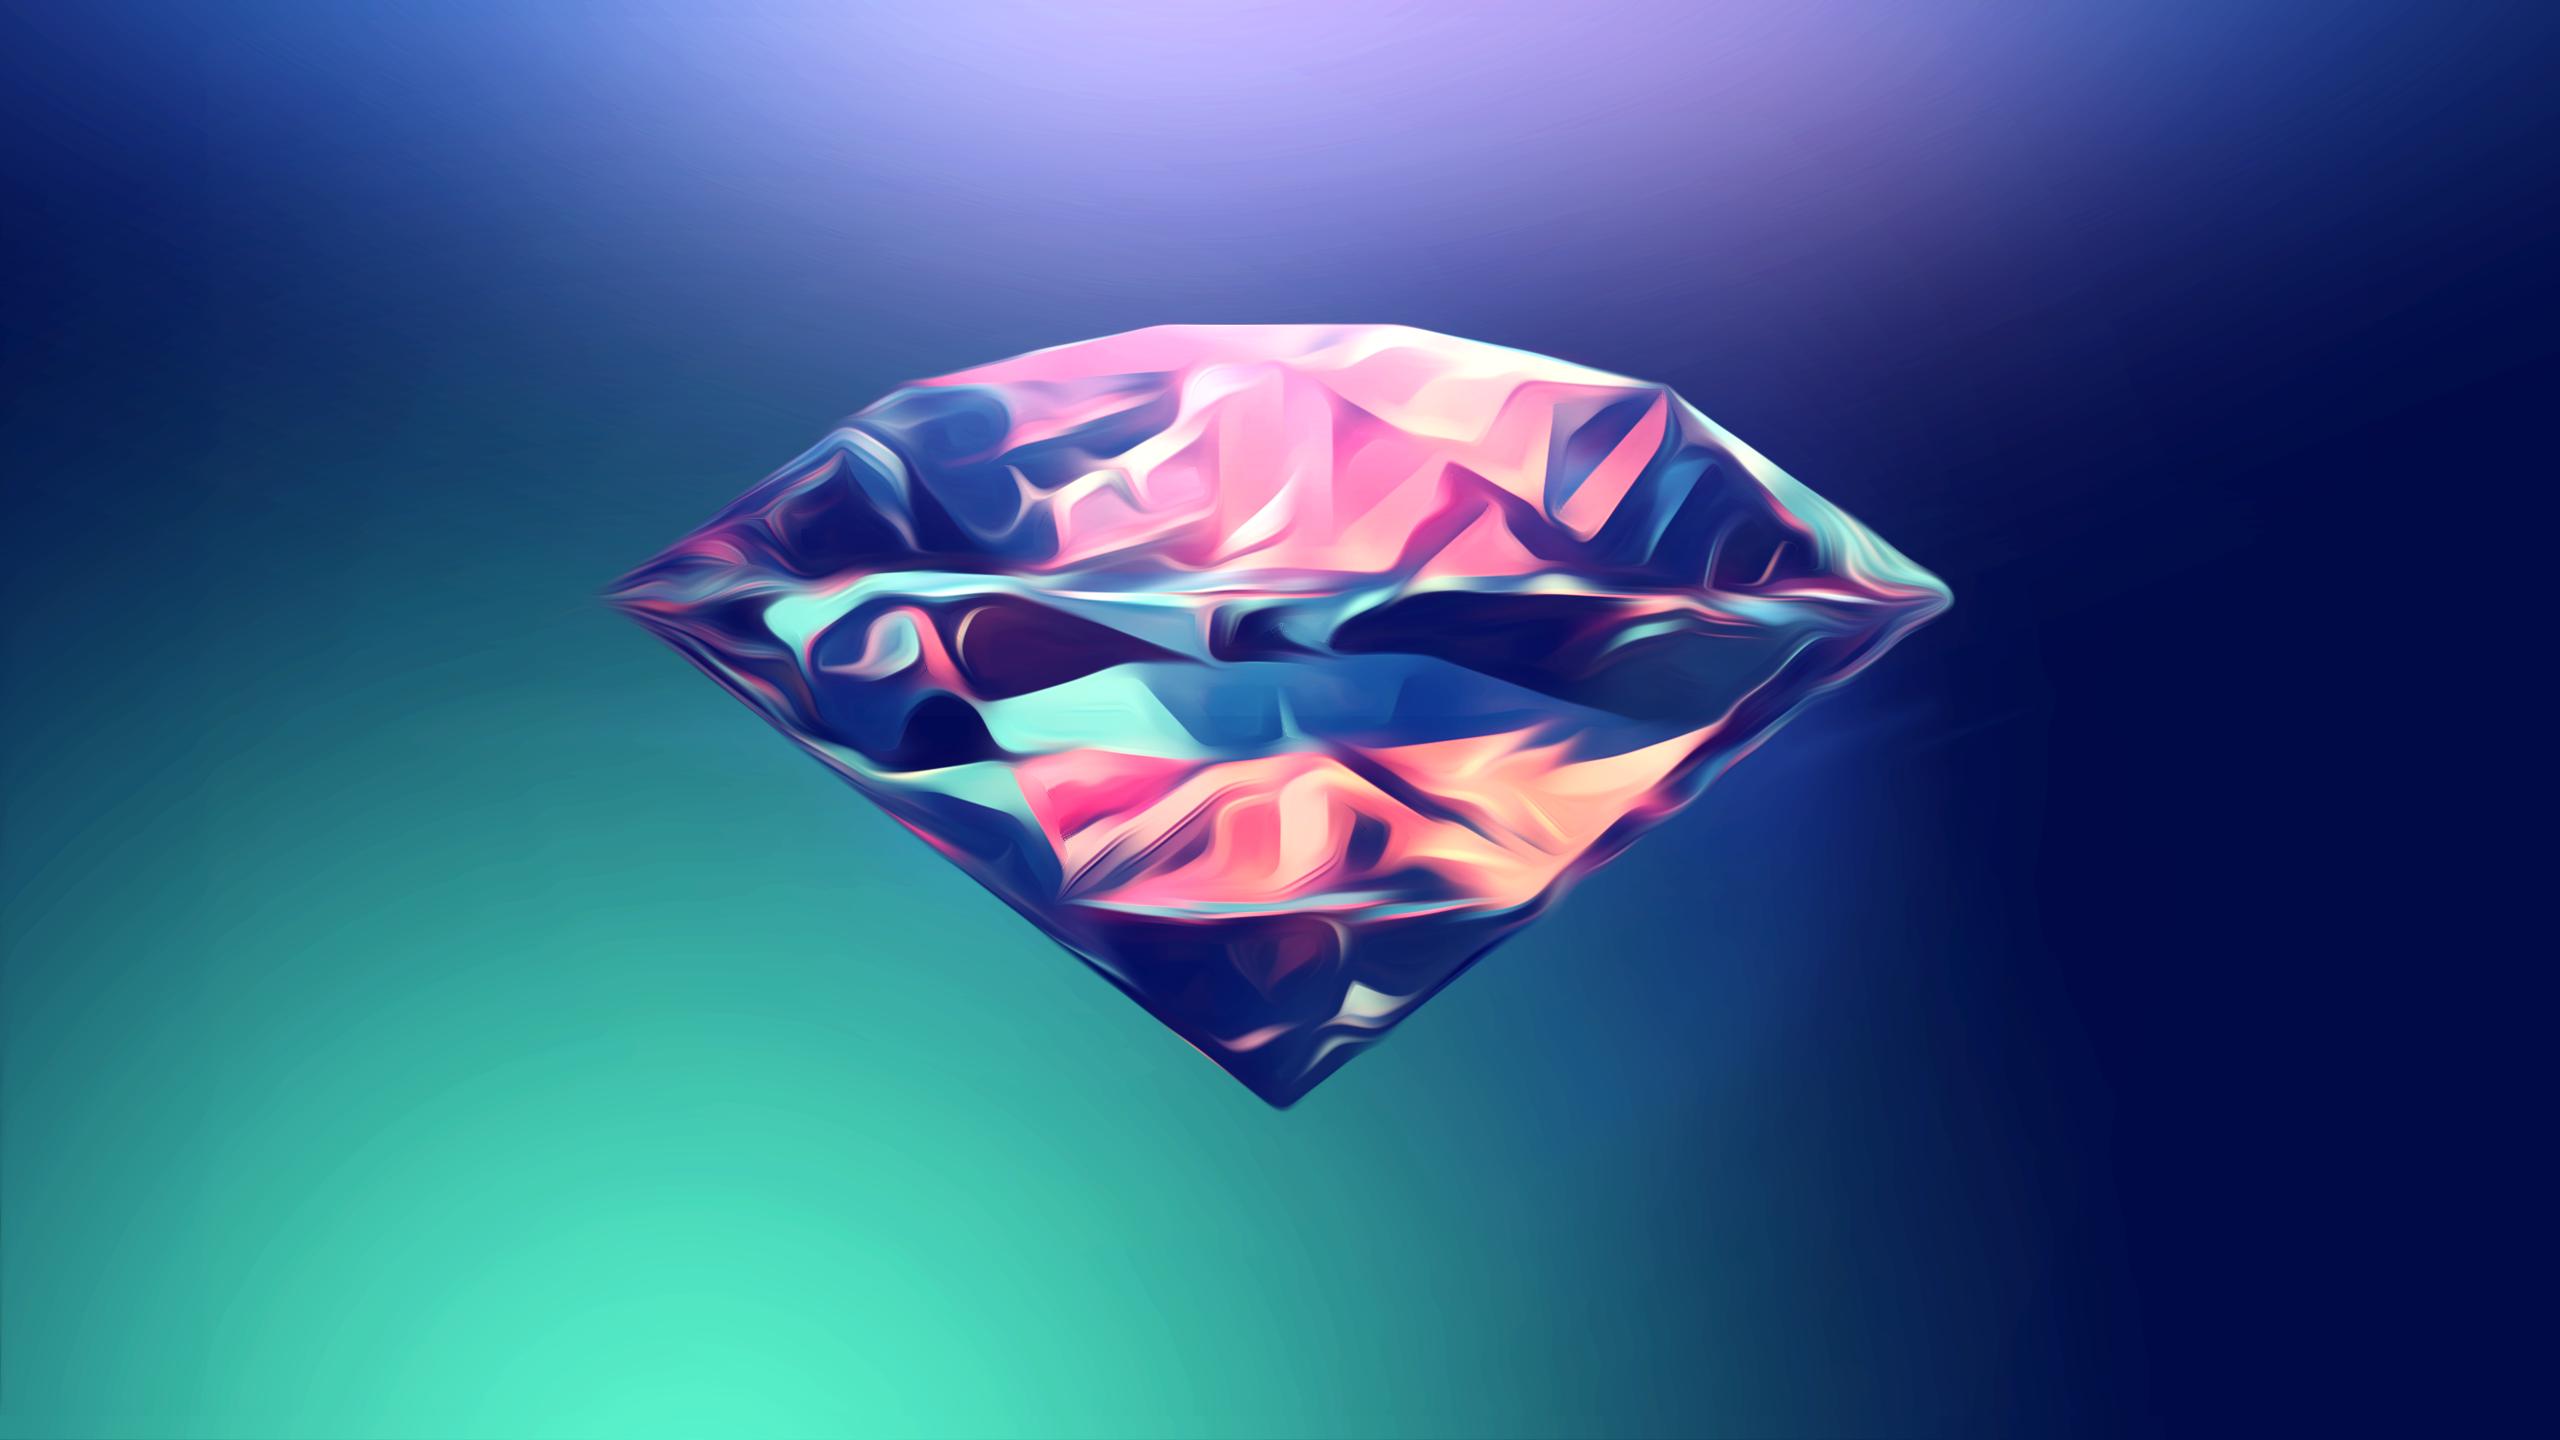 Free Download Abstract Diamond Wallpaper By Silentpotatogfx